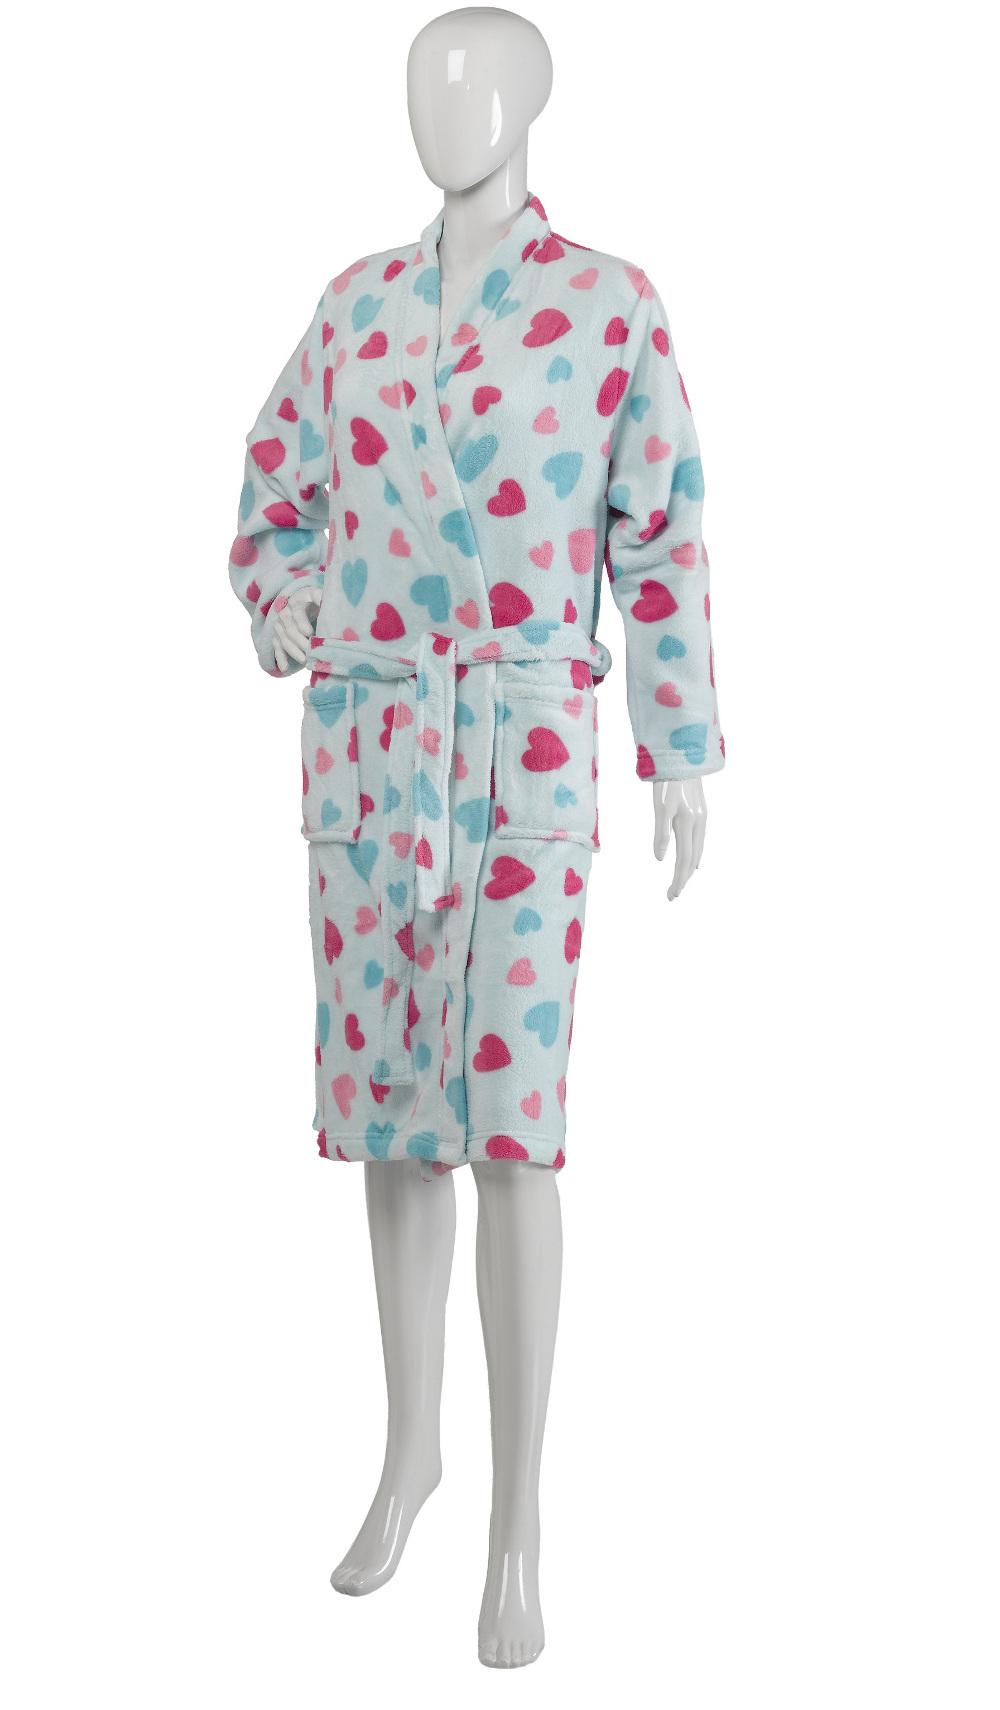 Slenderella Ladies Hearts or Star Design Bath Robes Soft Fleece Dressing Gown